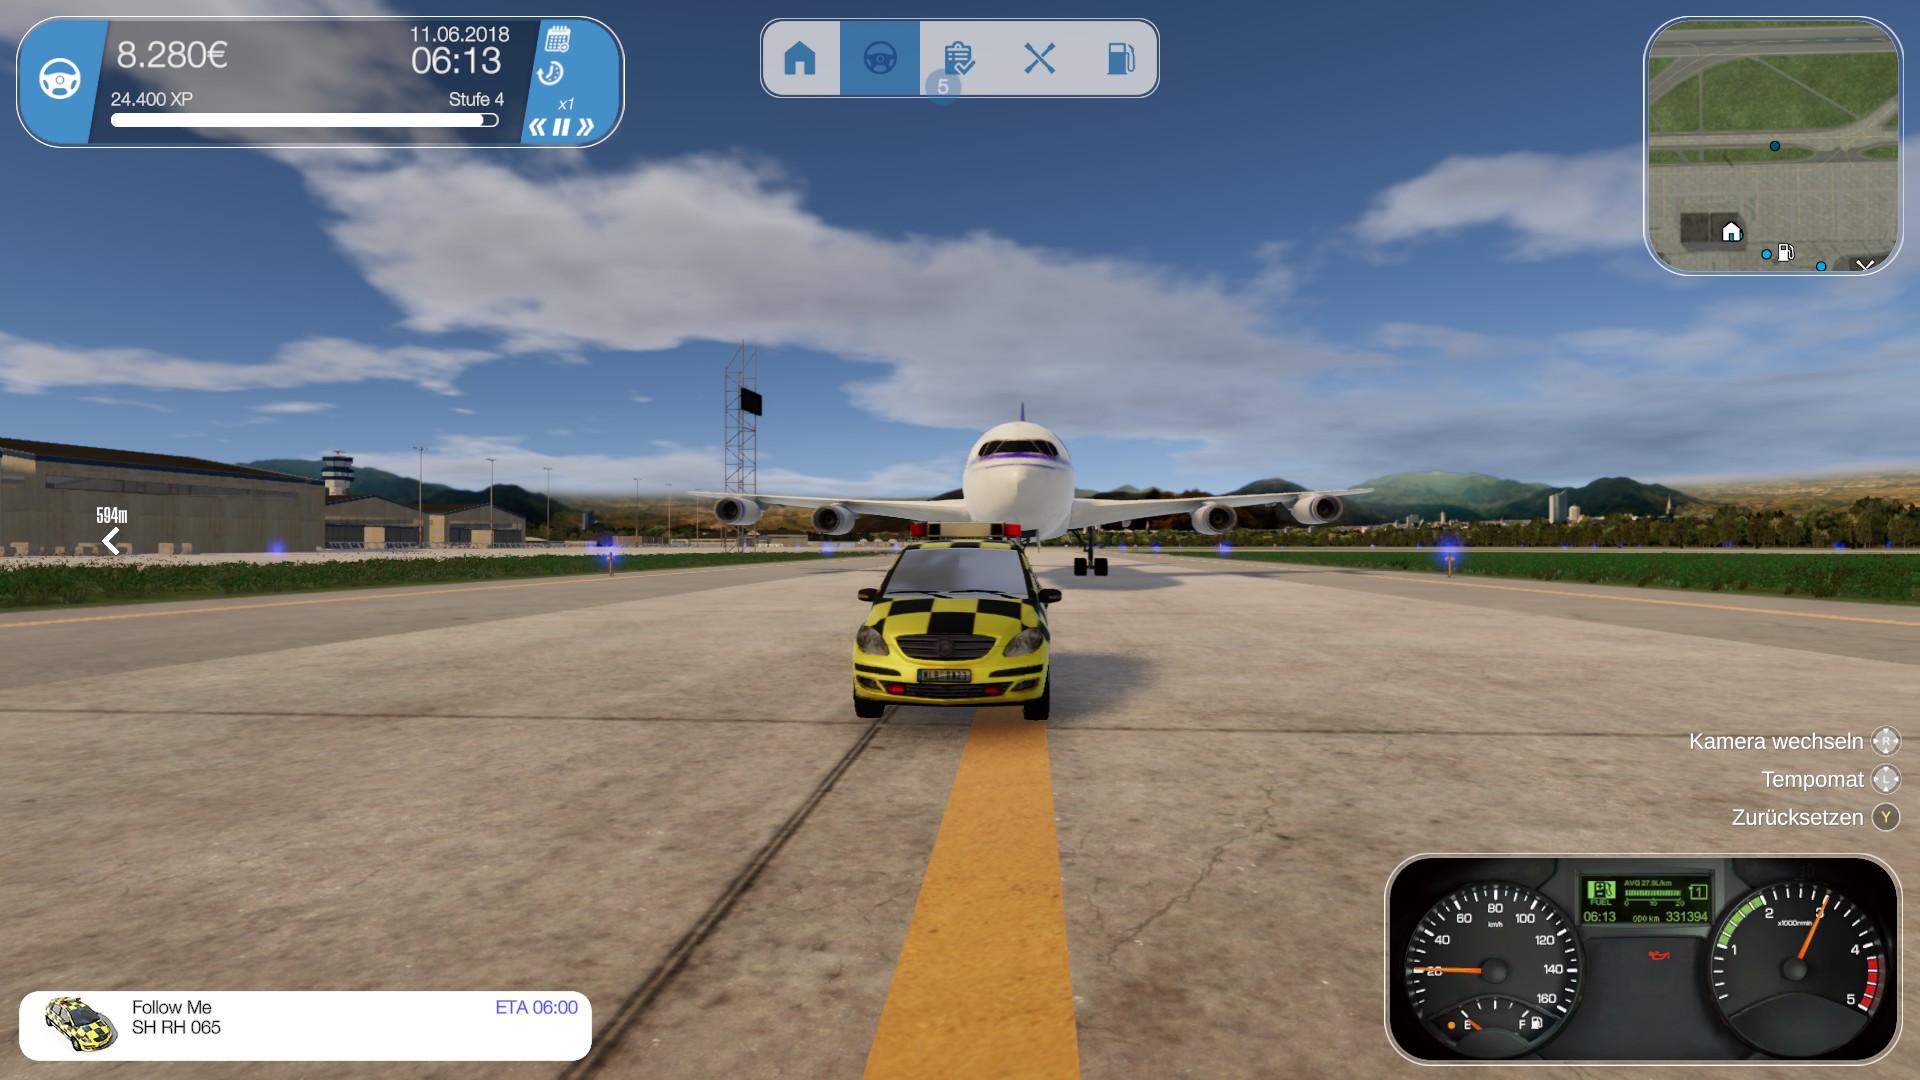 steam community airport simulator 2019. Black Bedroom Furniture Sets. Home Design Ideas